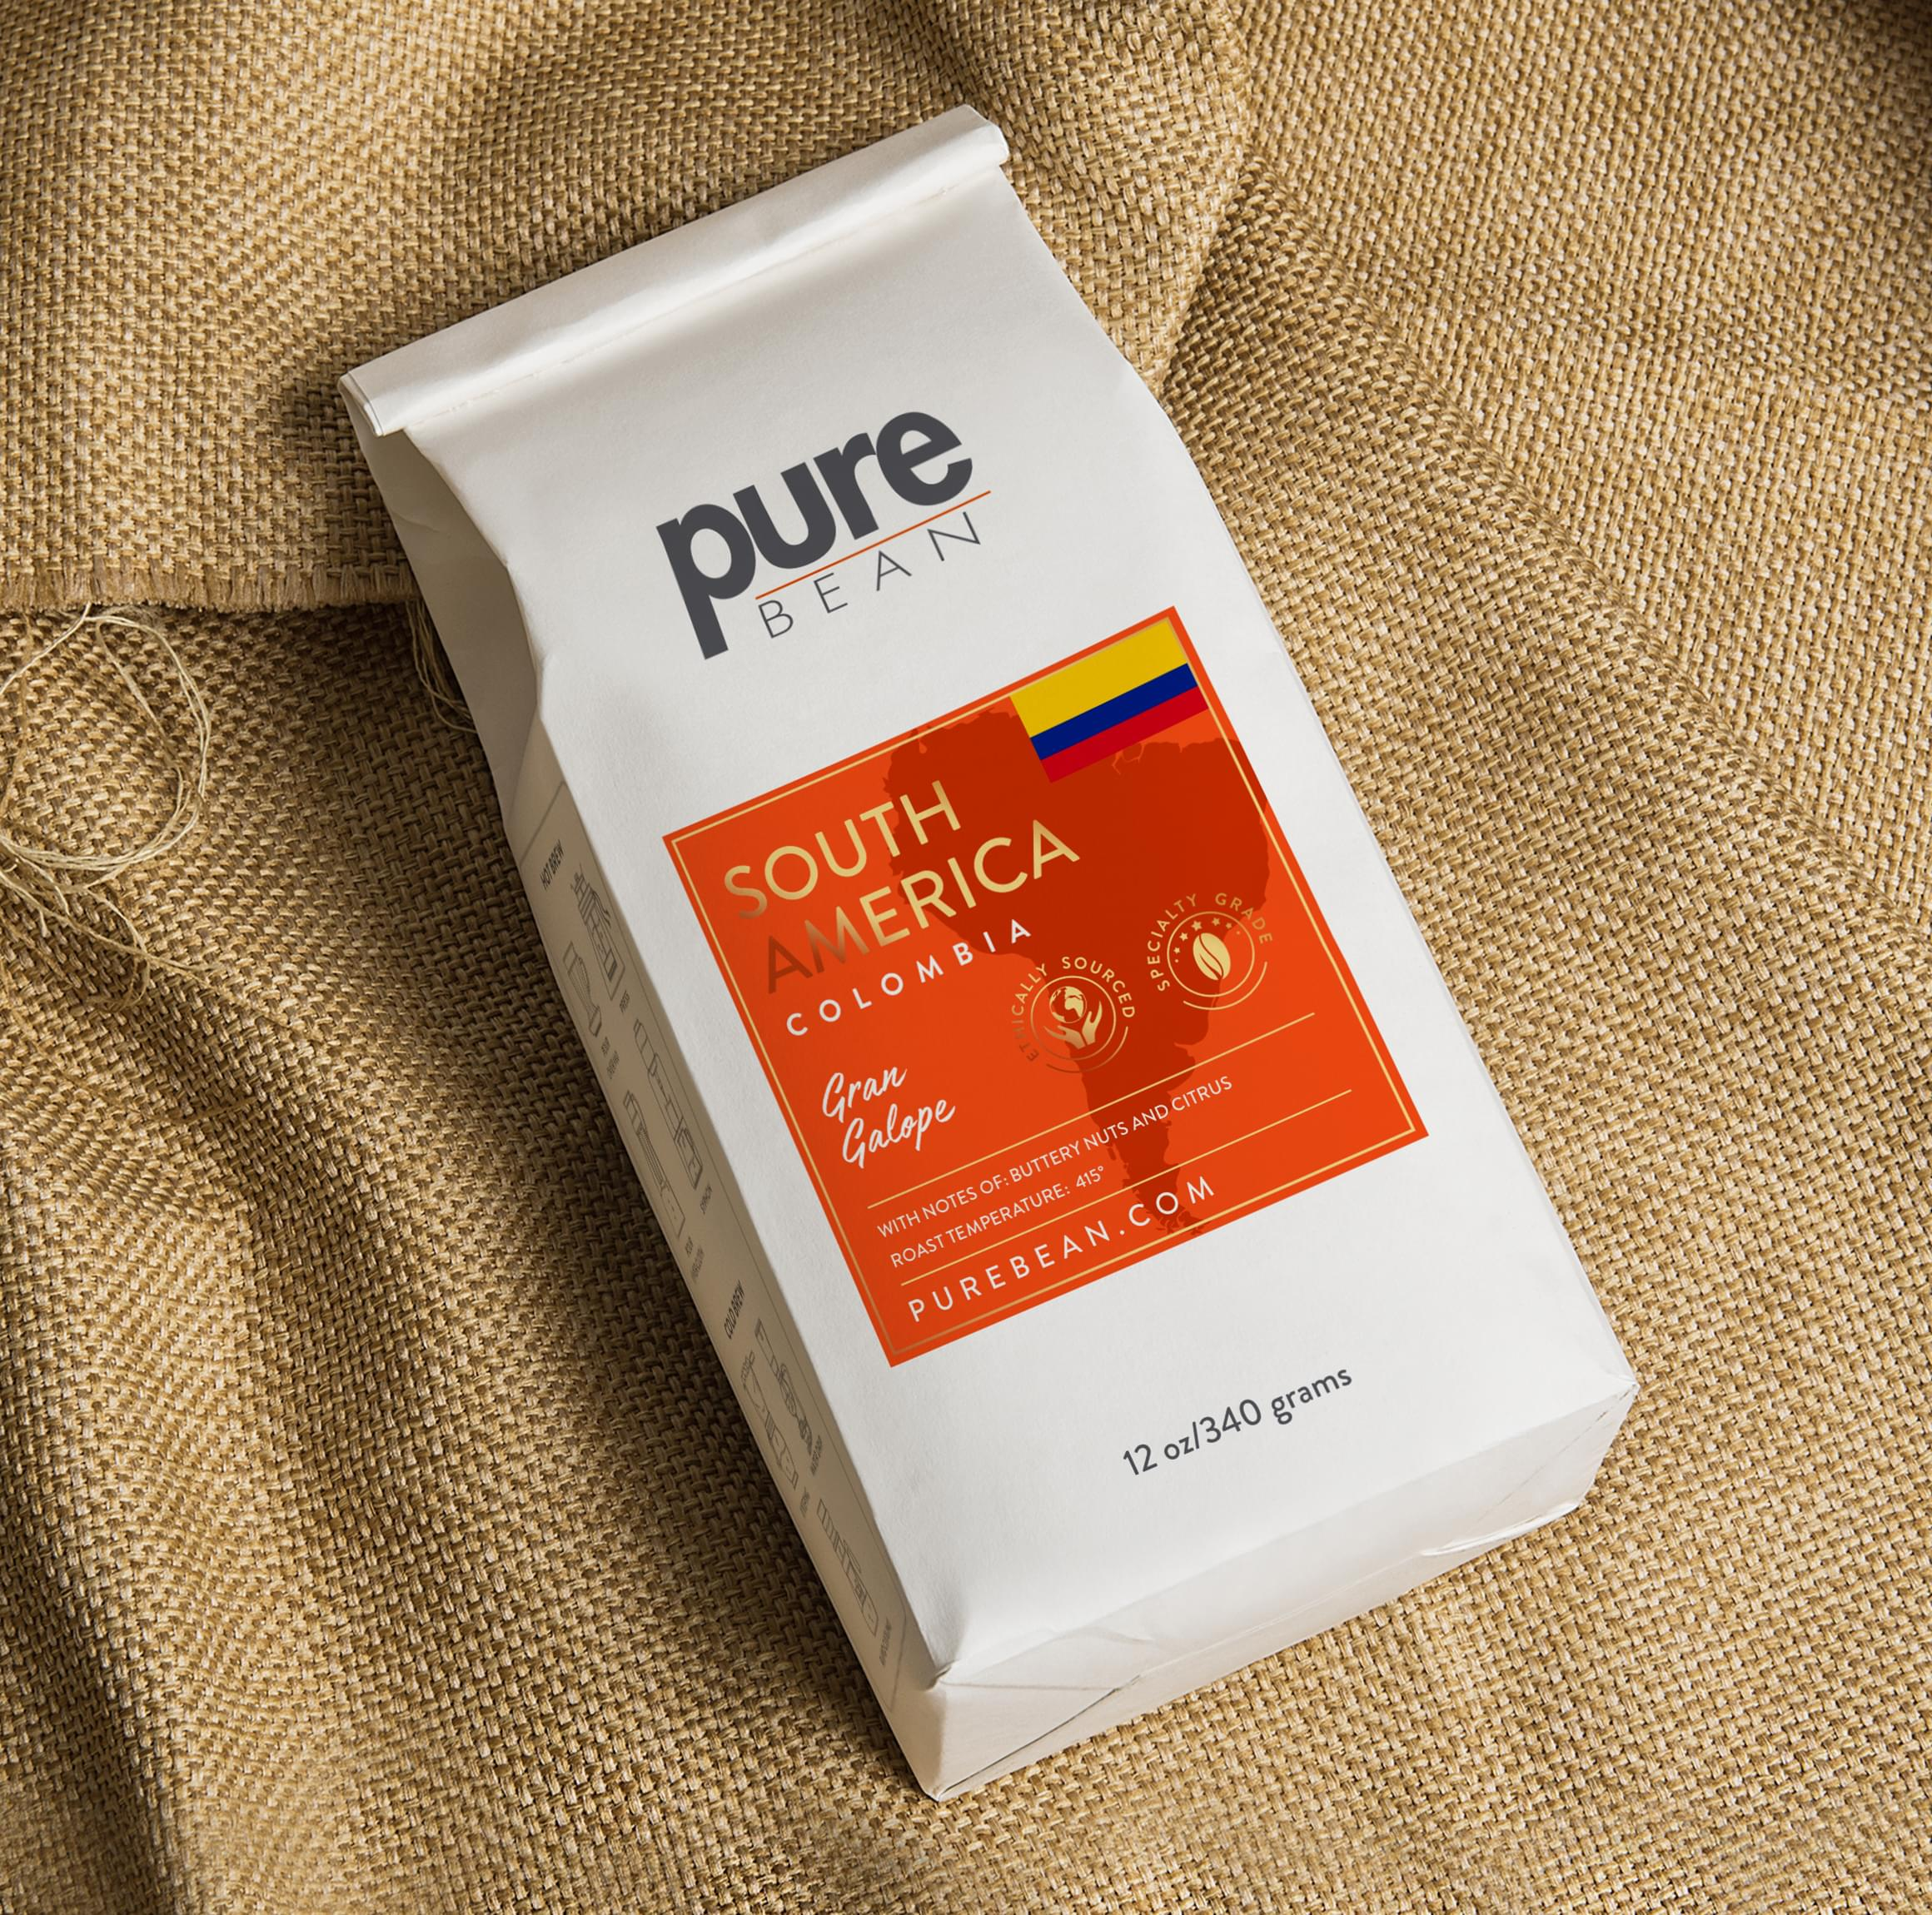 PURE BEAN Packaging